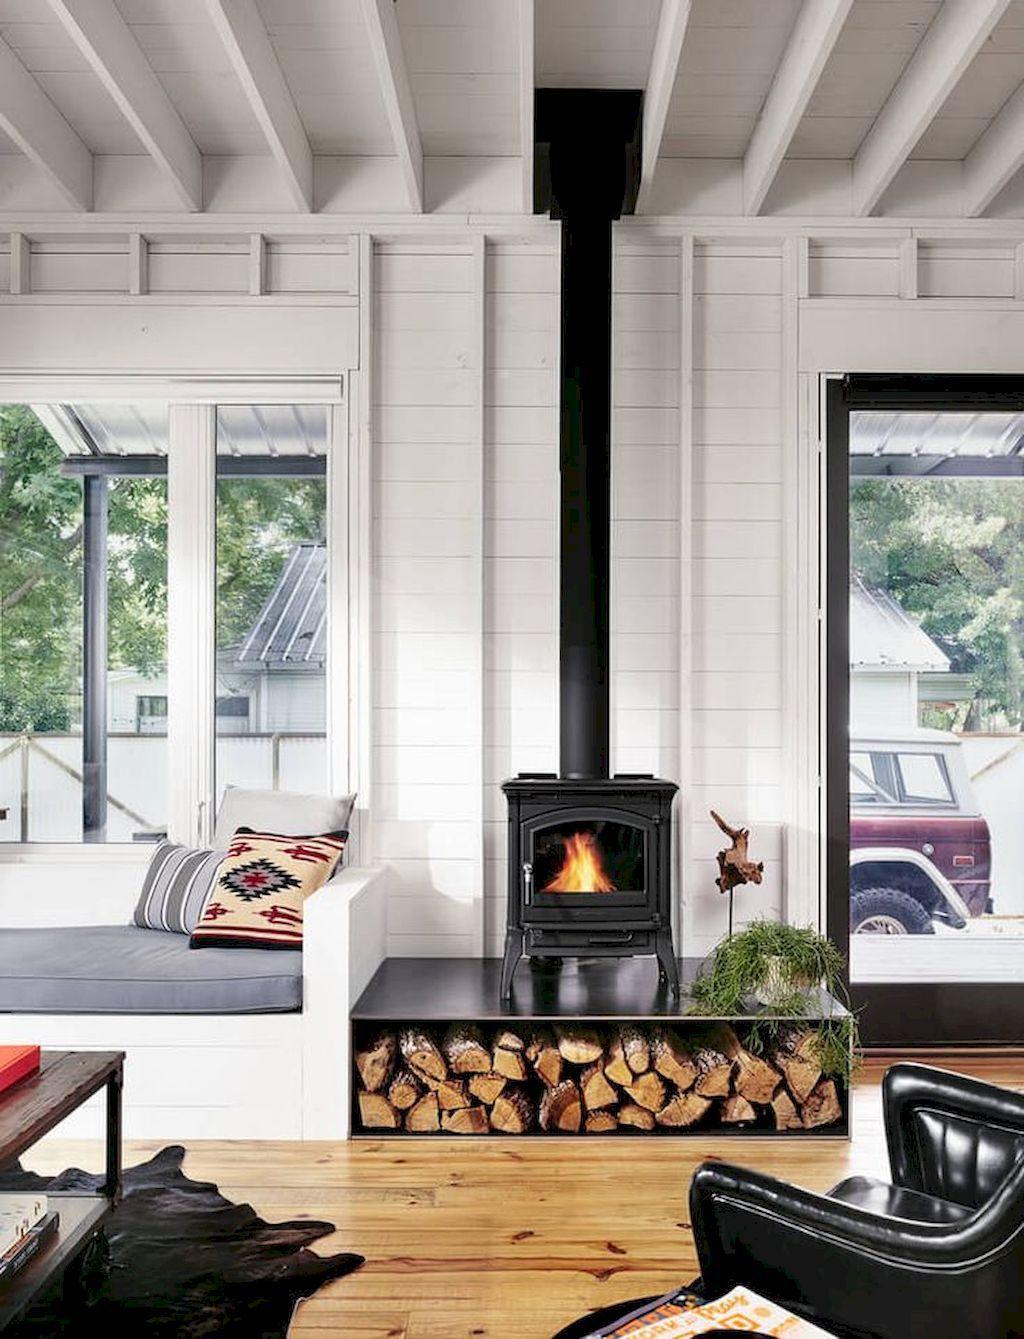 60 Scandinavian Fireplace Ideas For Your Living Room 64 Farm House Living Room Modern Farmhouse Living Room Decor Modern Farmhouse Living Room